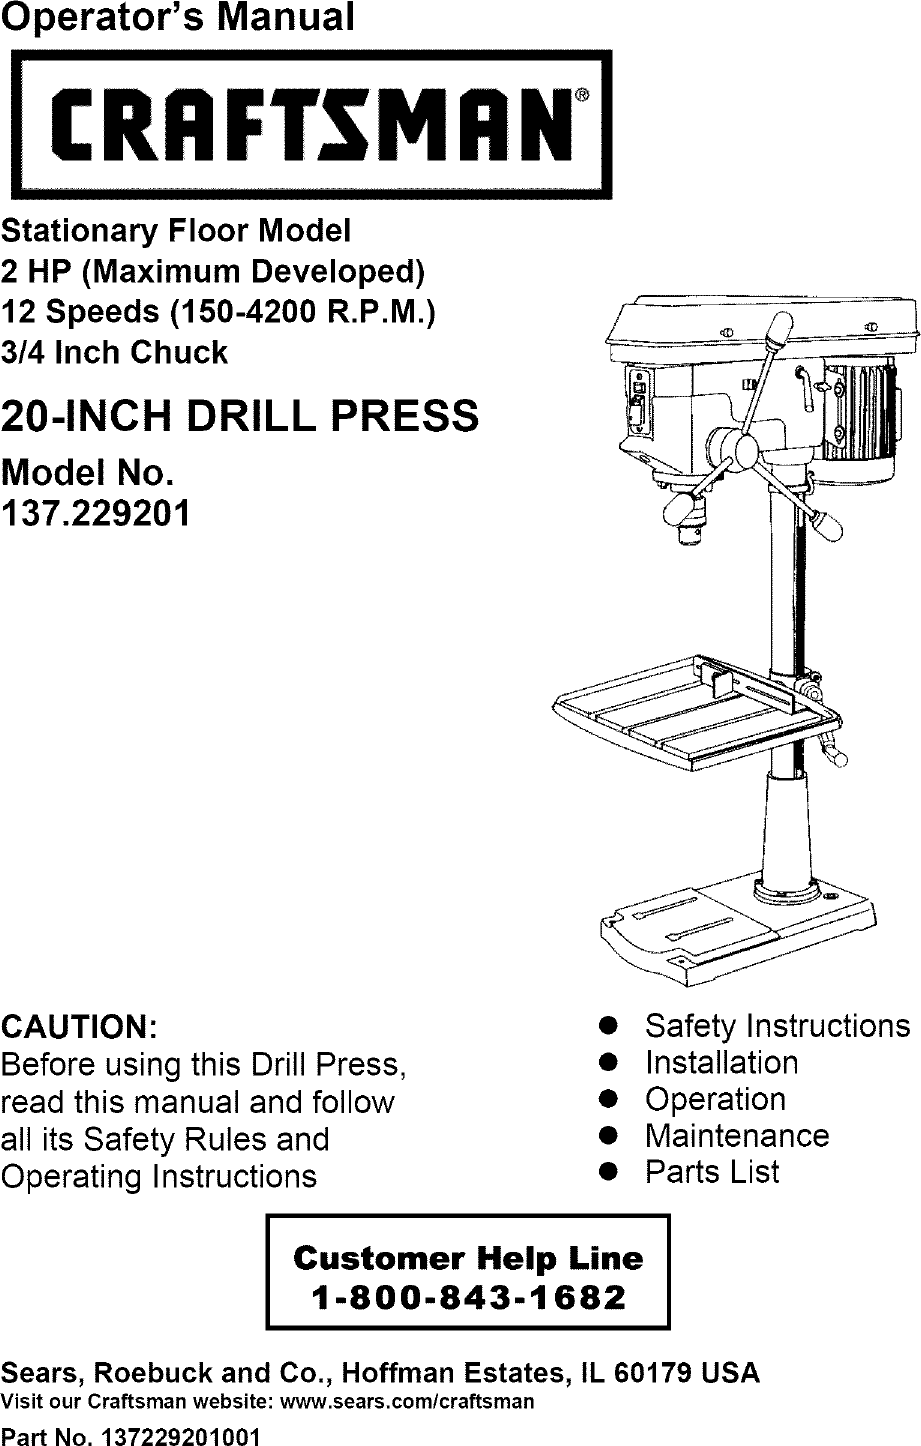 medium resolution of craftsman 137229200 user manual 20 drill press manuals and guides l0803566